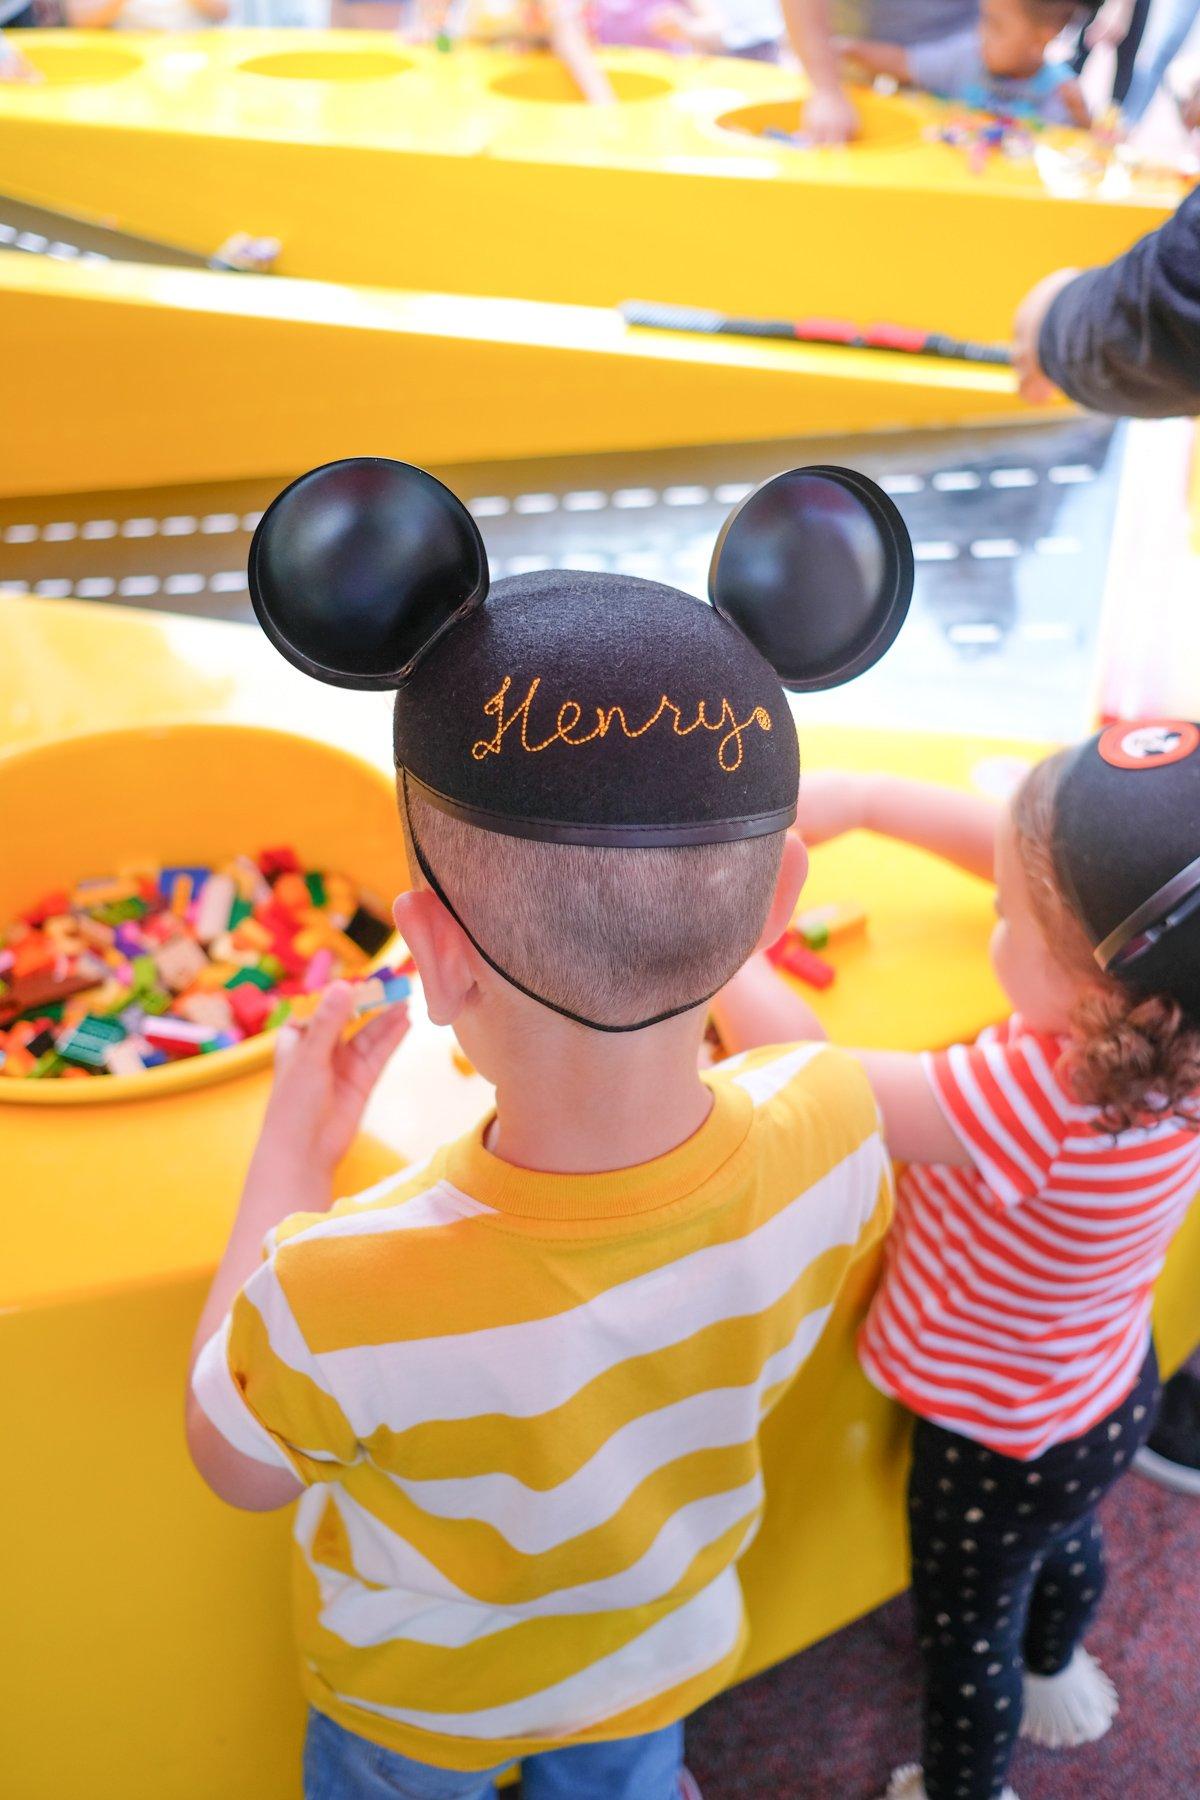 Best Secret Disneyland Tips and Hacks